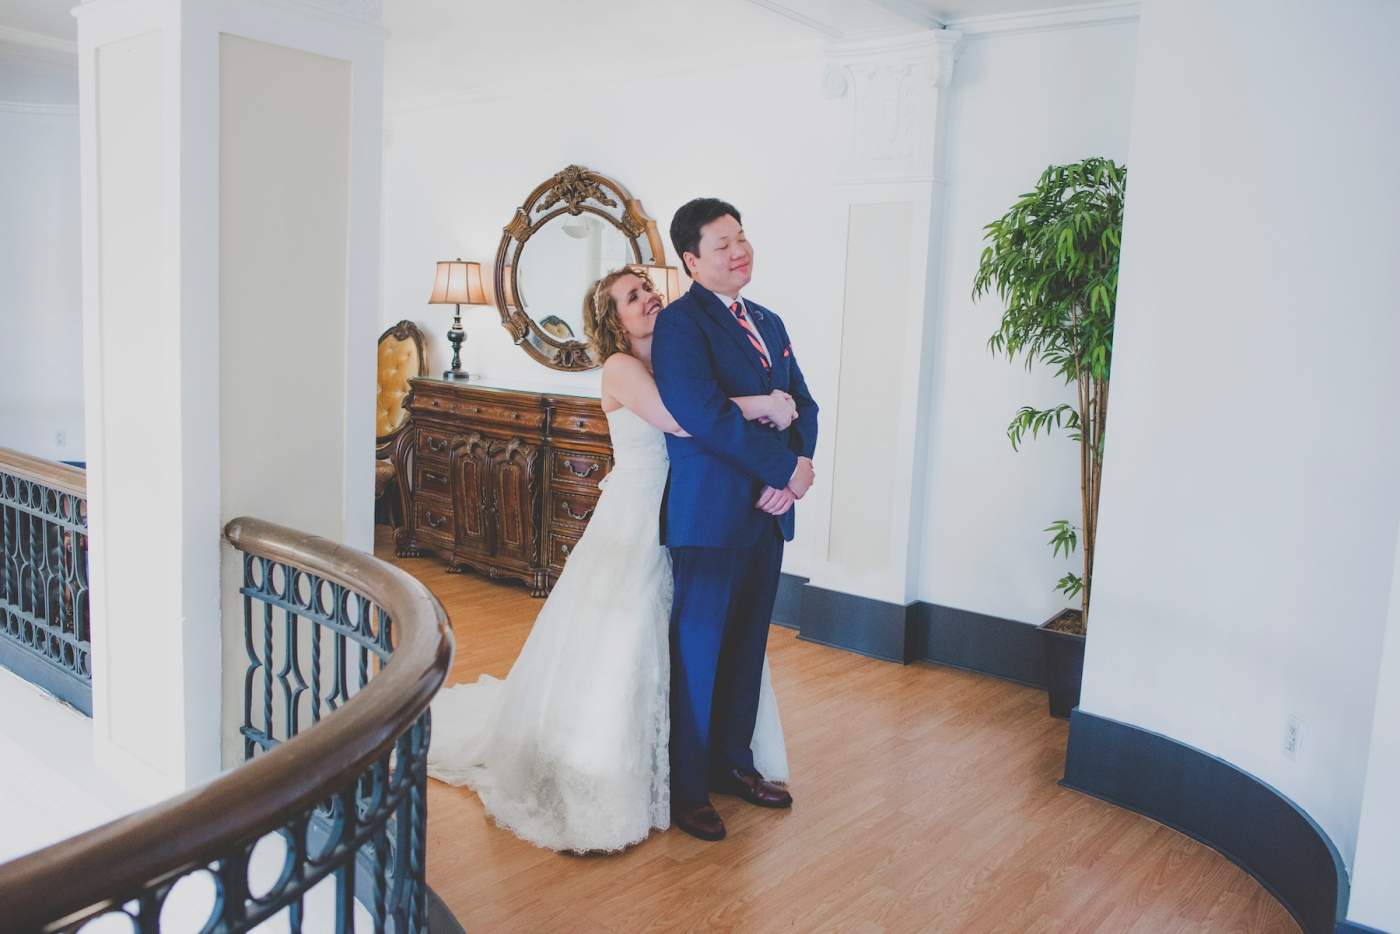 DSC_2040Everett_Wedding_Ballroom_Jane_Speleers_photography_Rachel_and_Edmund_First_look_2017